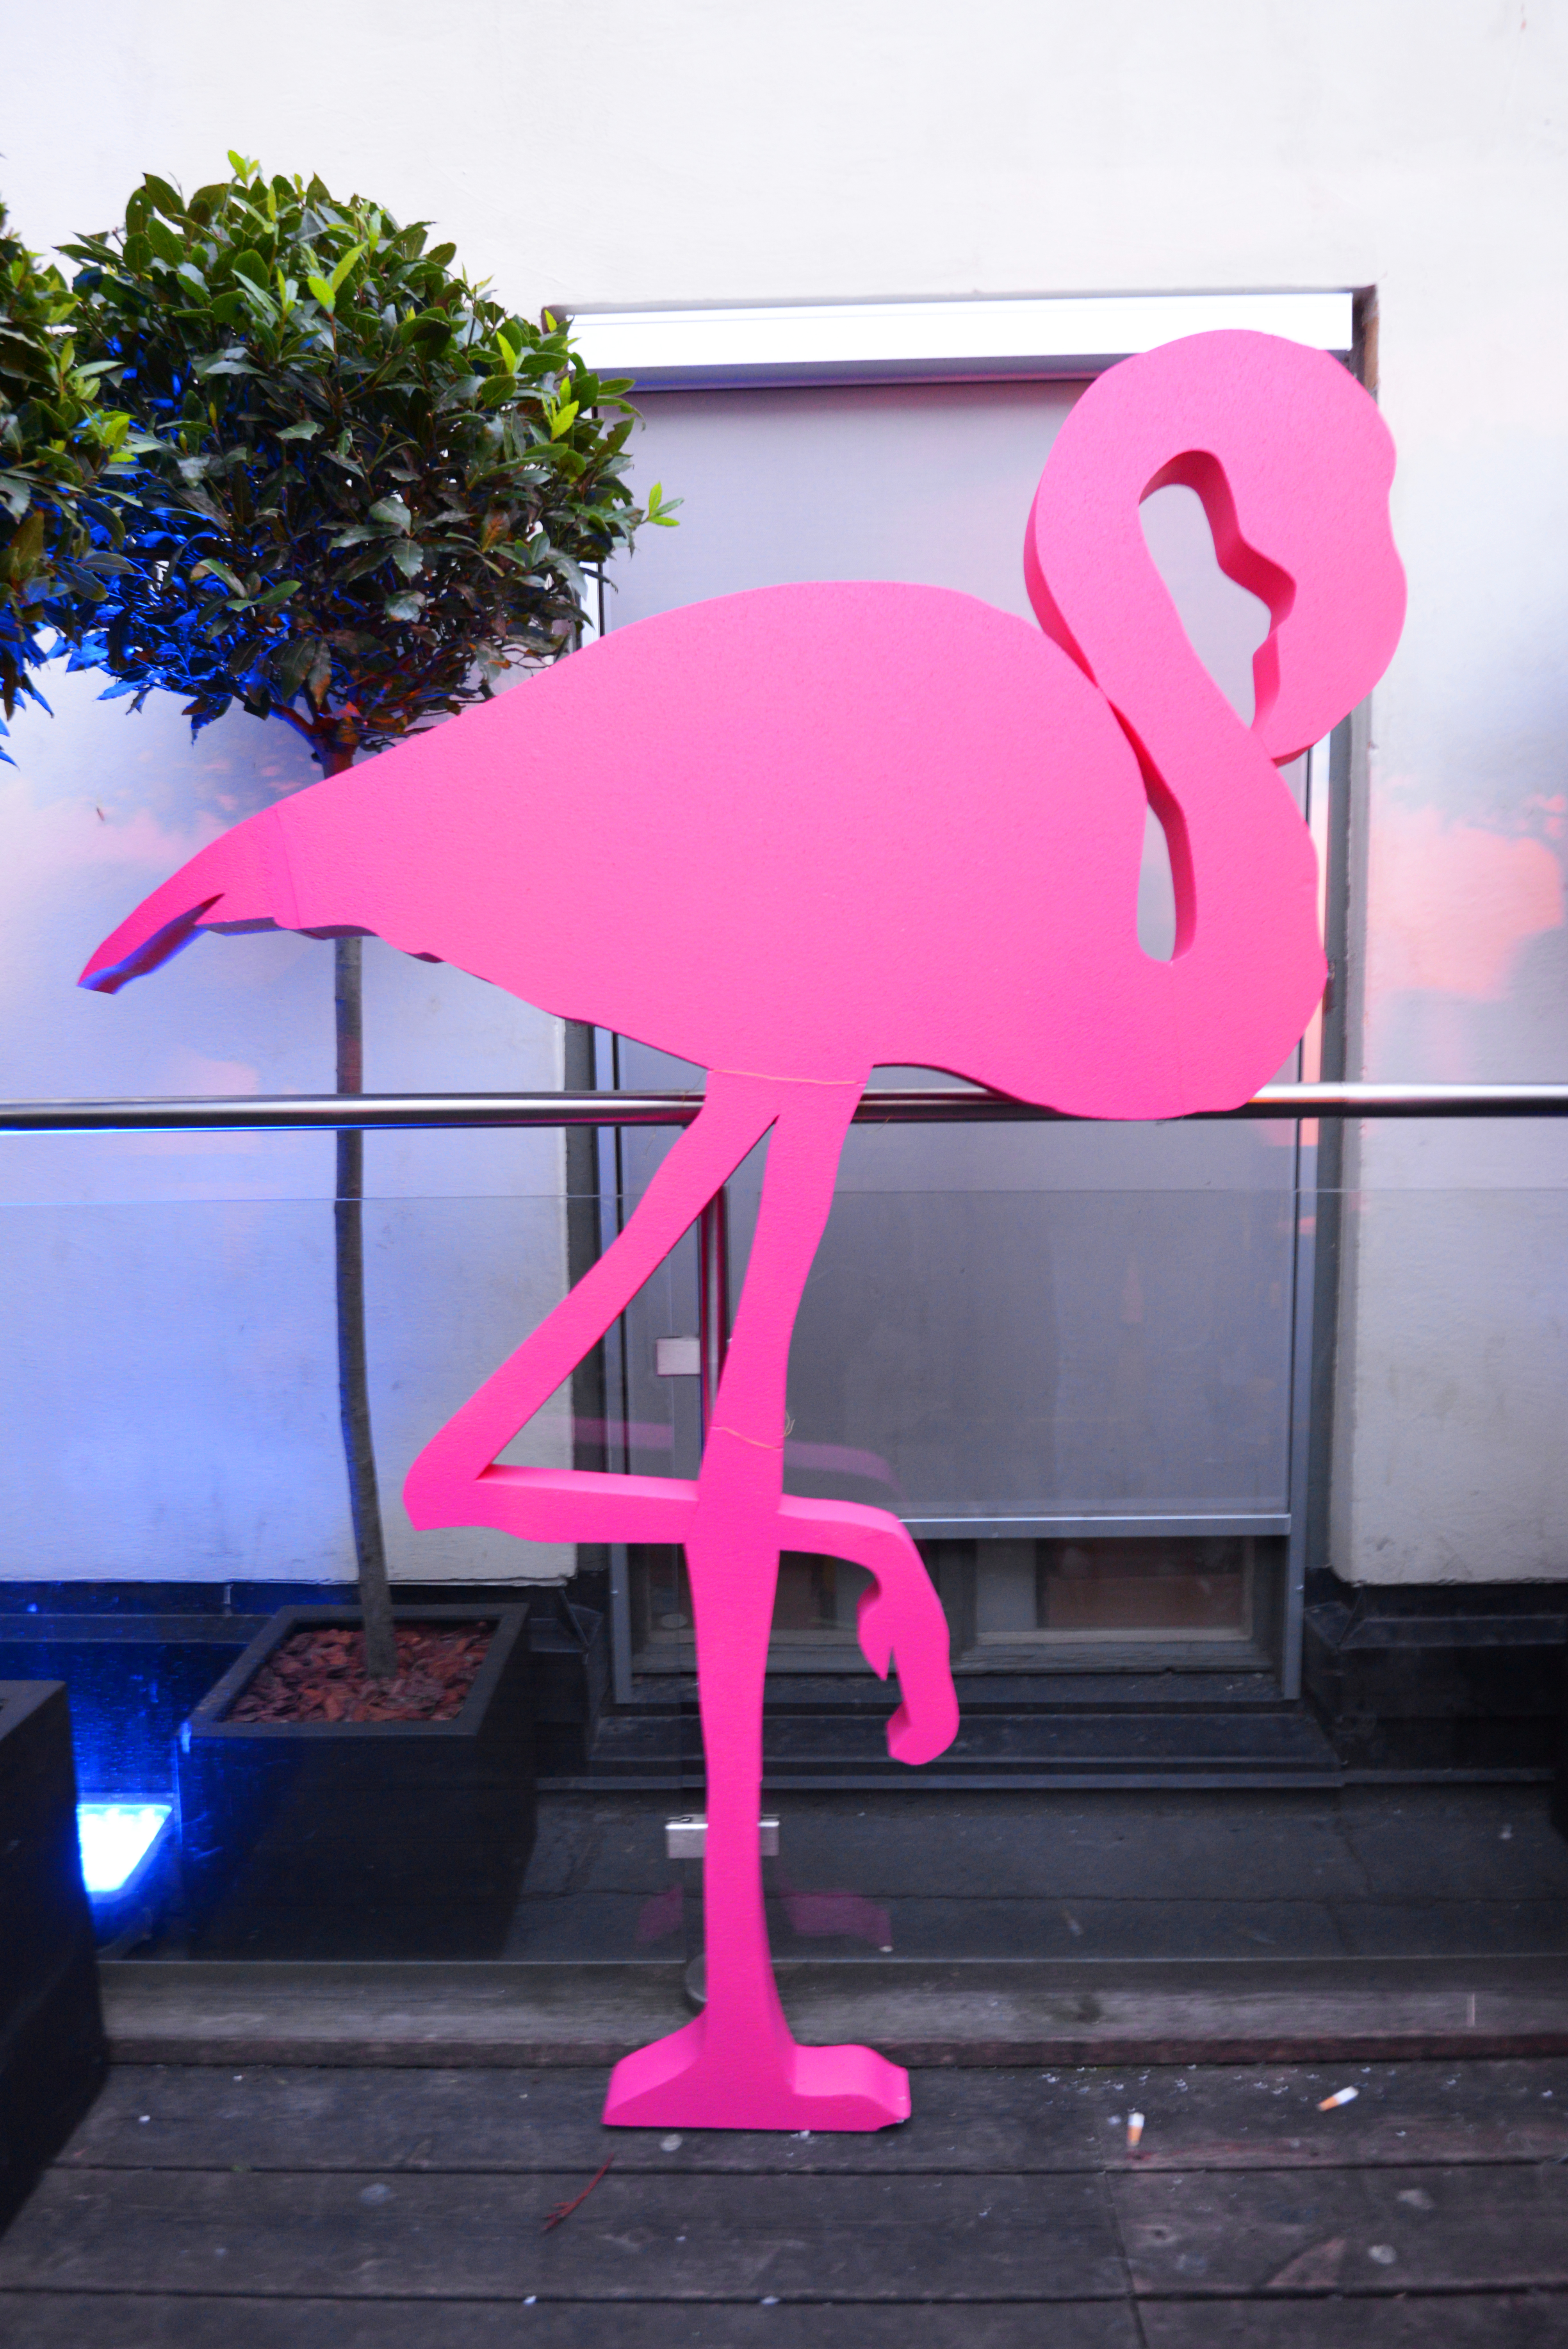 Miami Vice flamingo